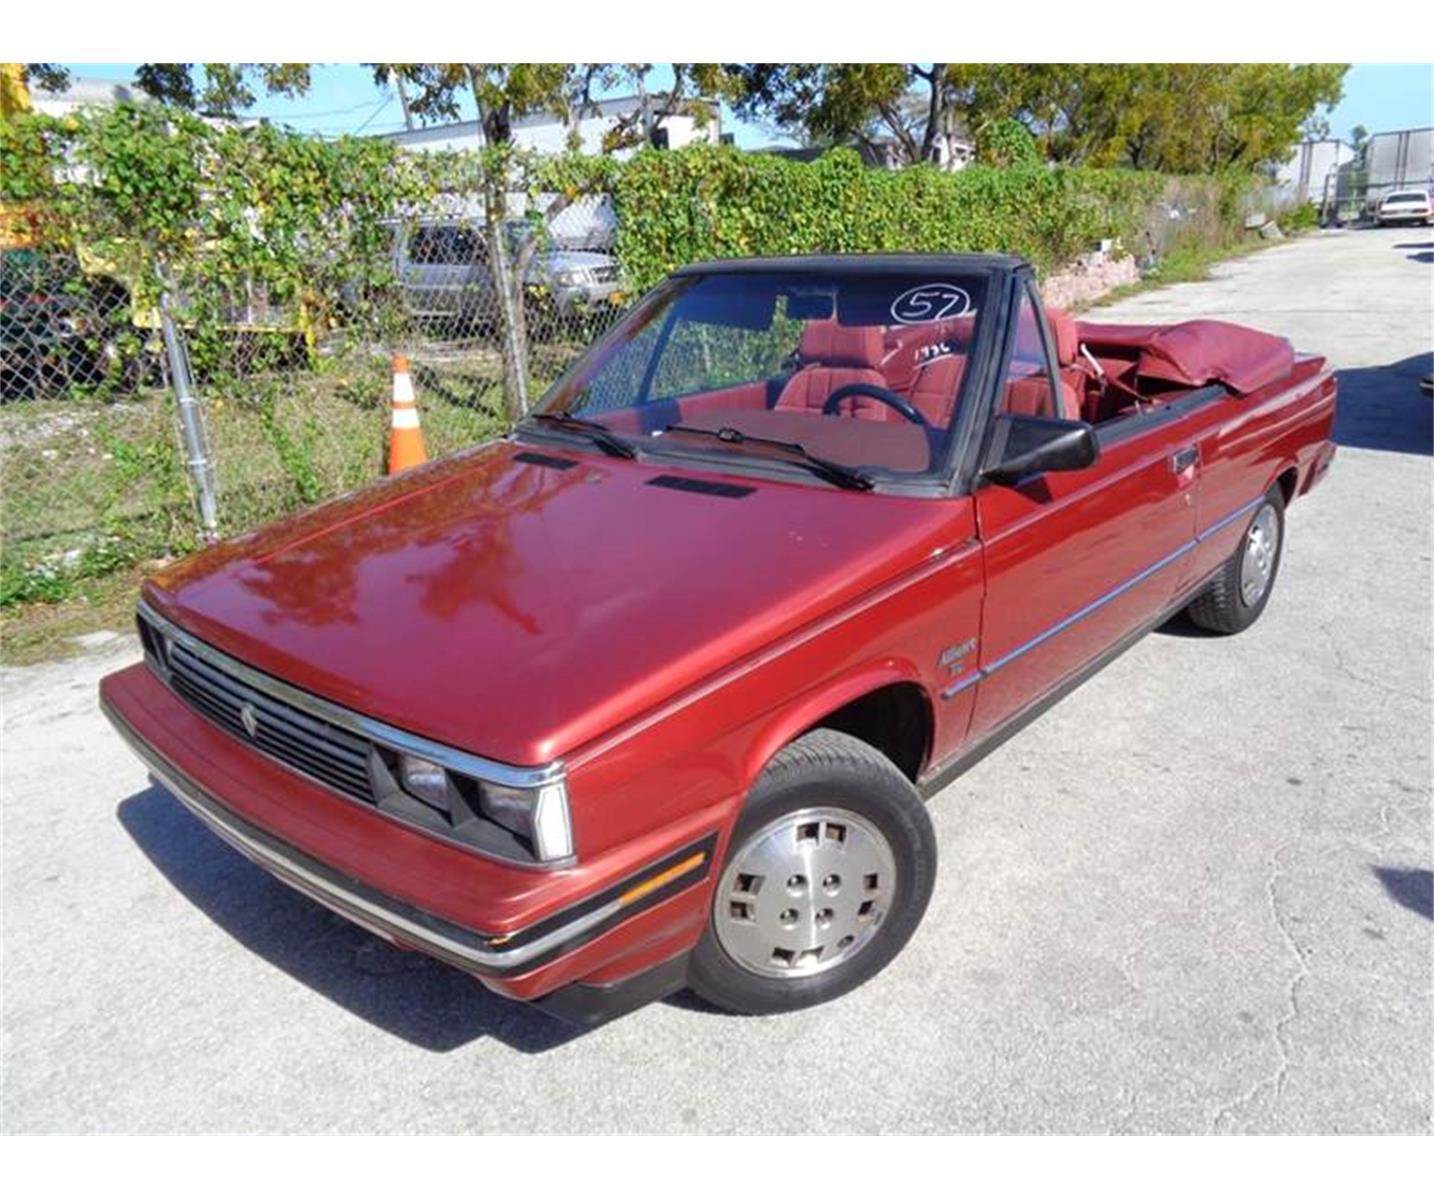 https://photos.classiccars.com/cc-temp/listing/127/1624/18197829-1986-renault-alliance-srcset-xxl.jpg